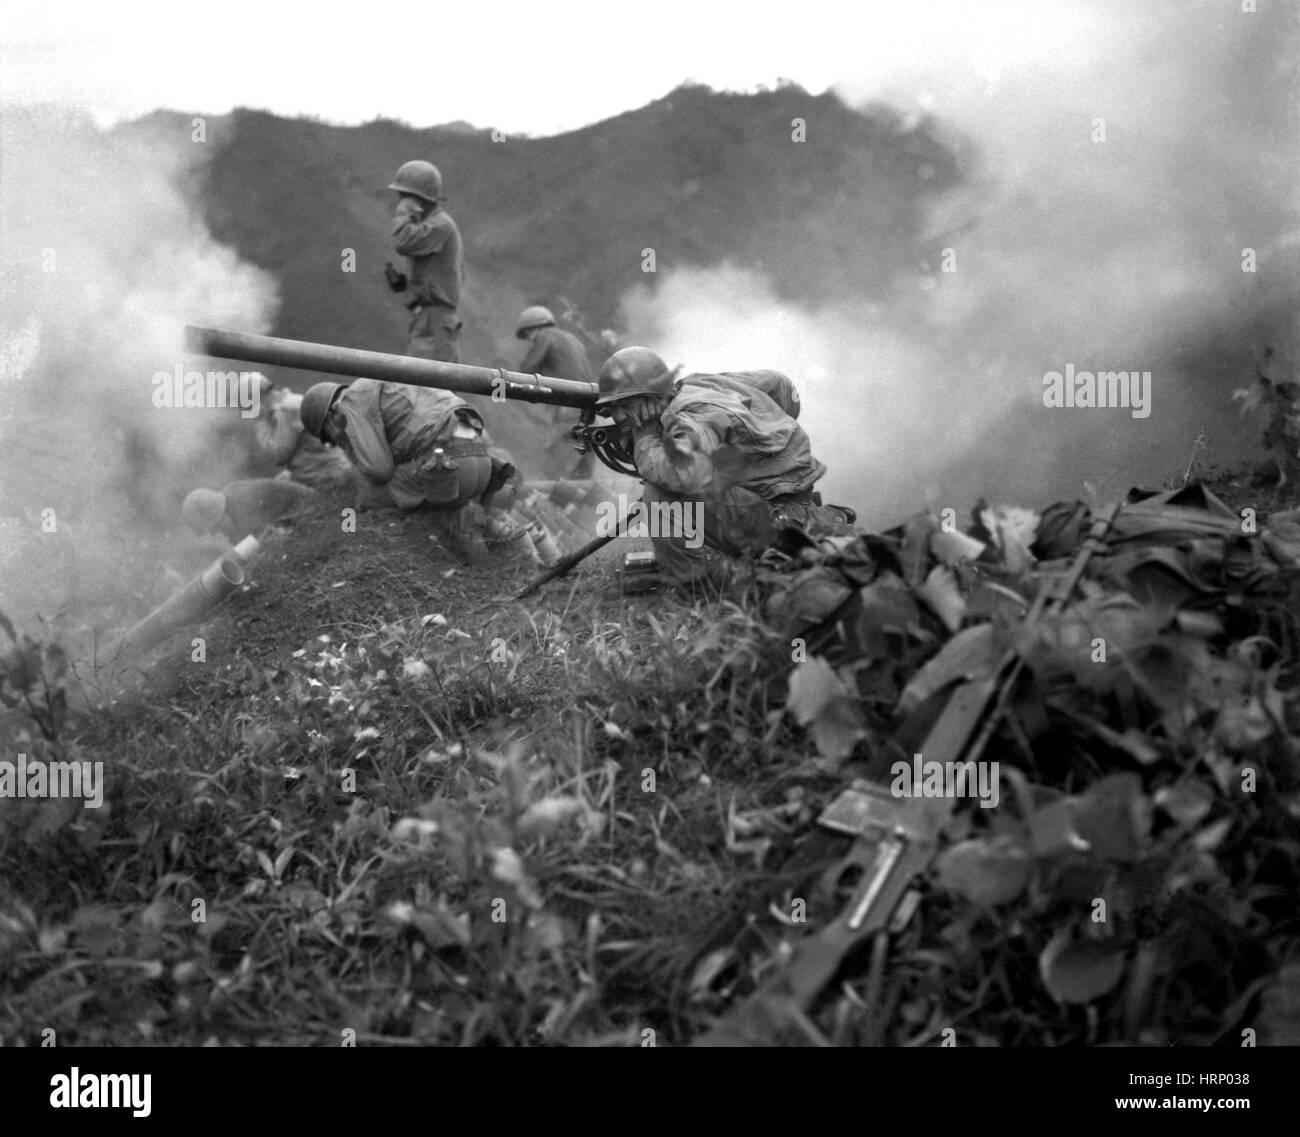 Korean War, Artillery Crew, 1951 - Stock Image